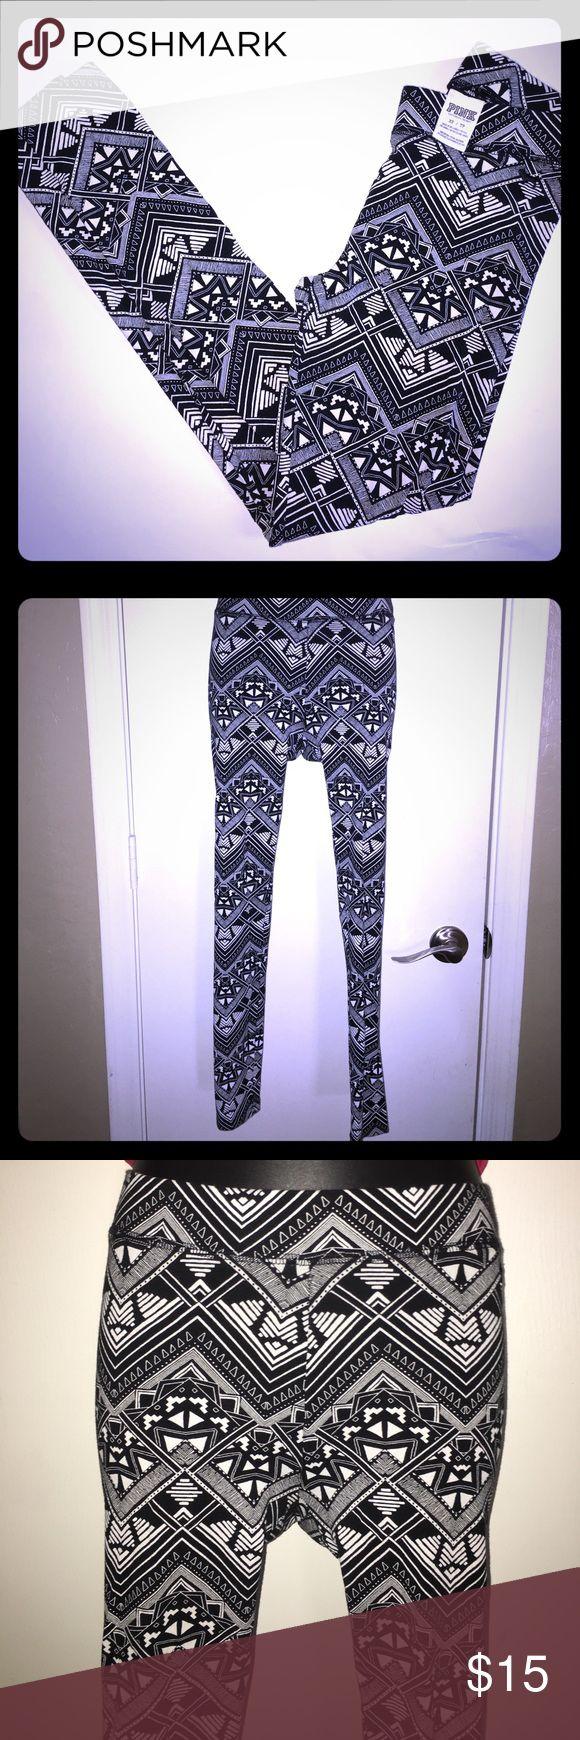 Leggings Black and white tribal print leggings PINK Victoria's Secret Pants Leggings